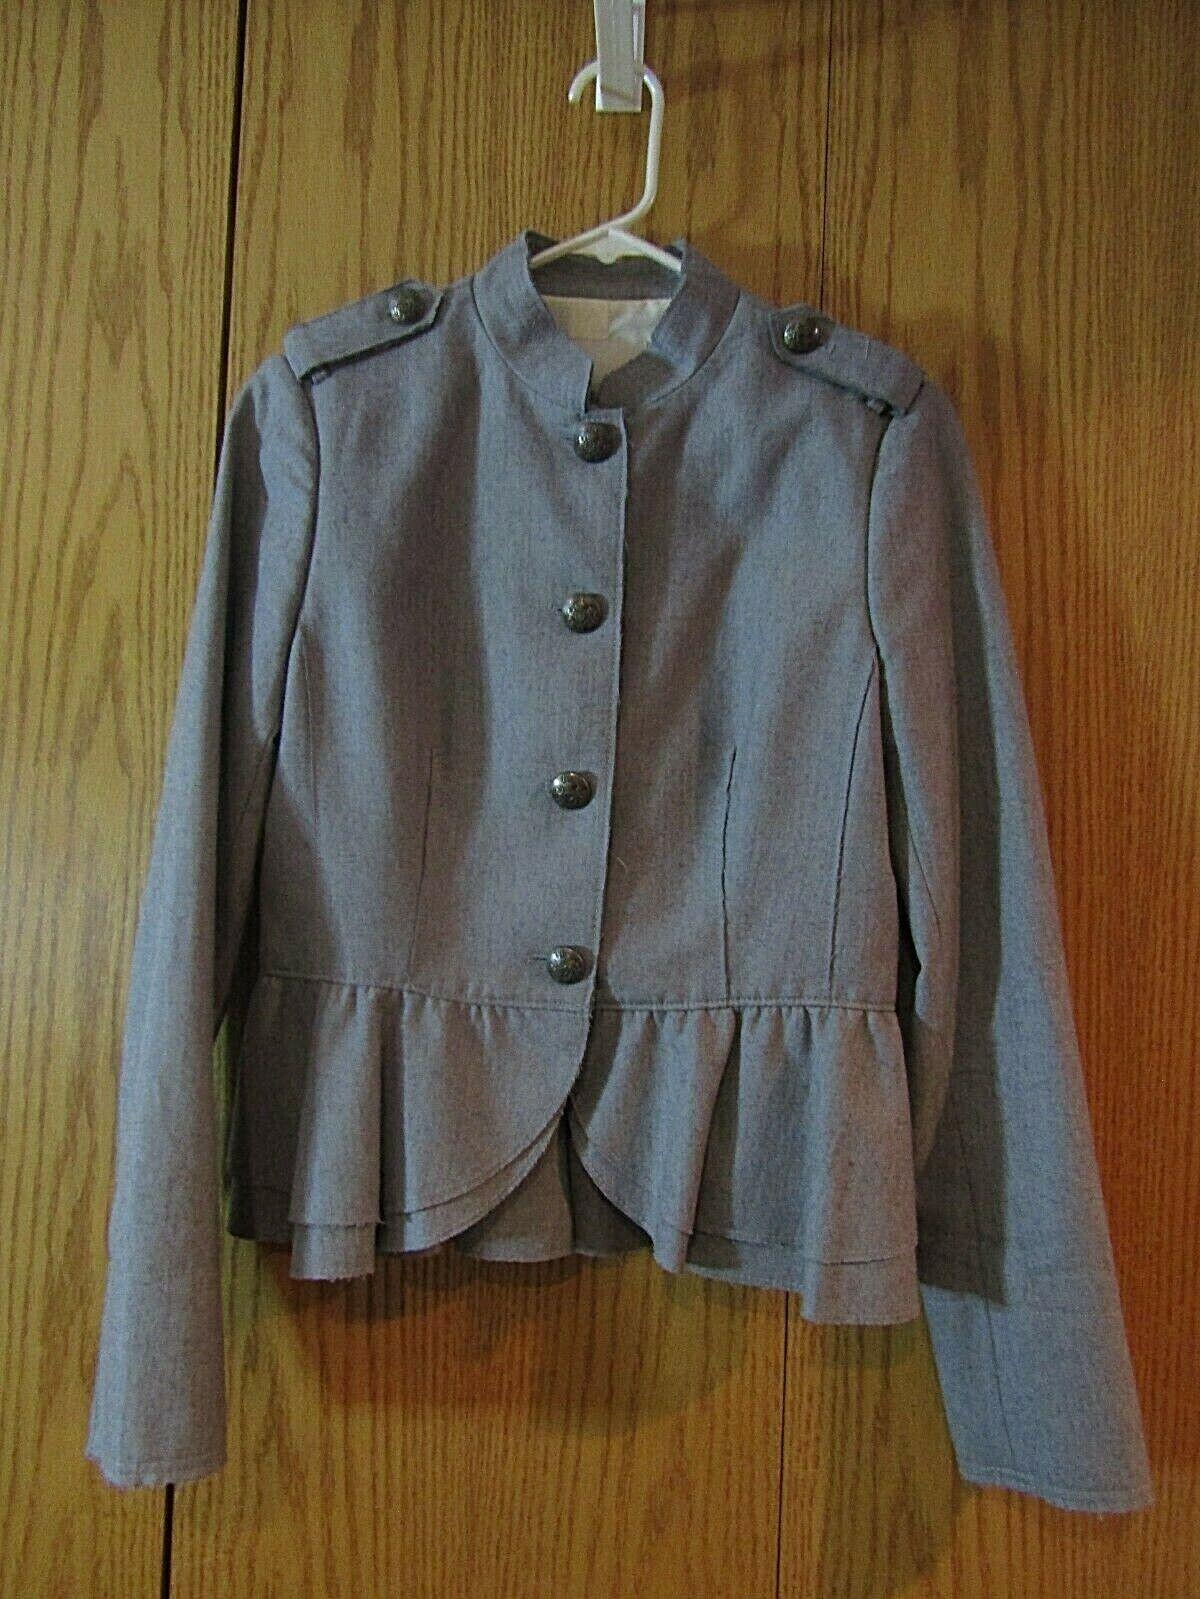 Banana Republic Women's Gray Military Style Jacket, Size 6 NWOT heritage